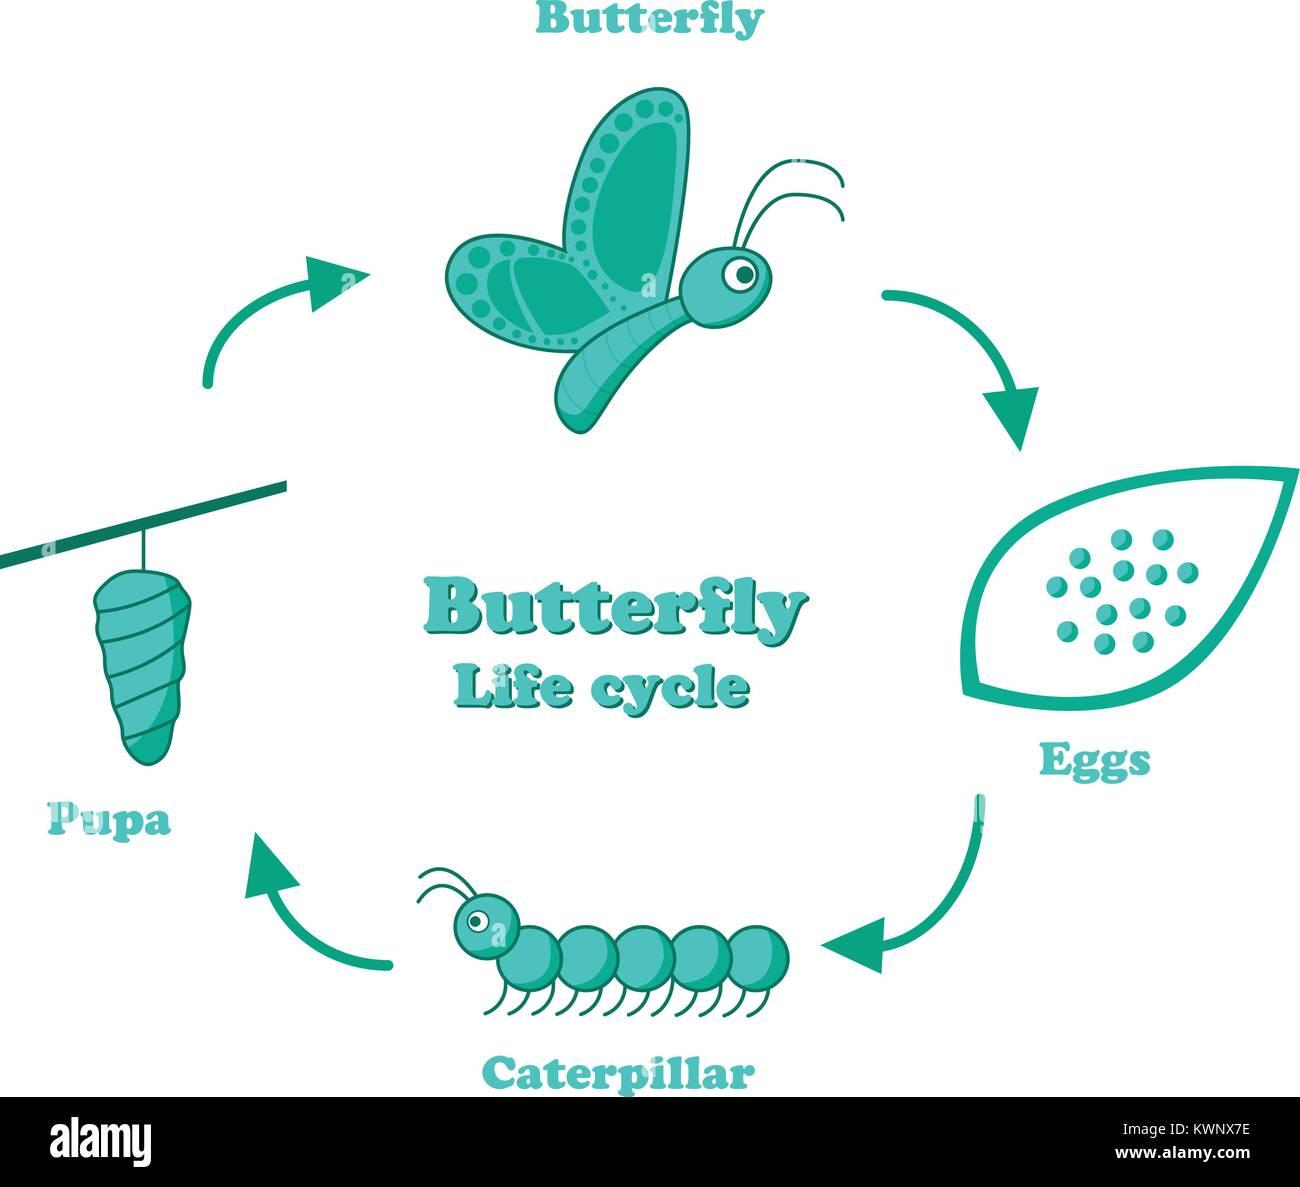 Life Cycle Diagram Stock Photos & Life Cycle Diagram Stock